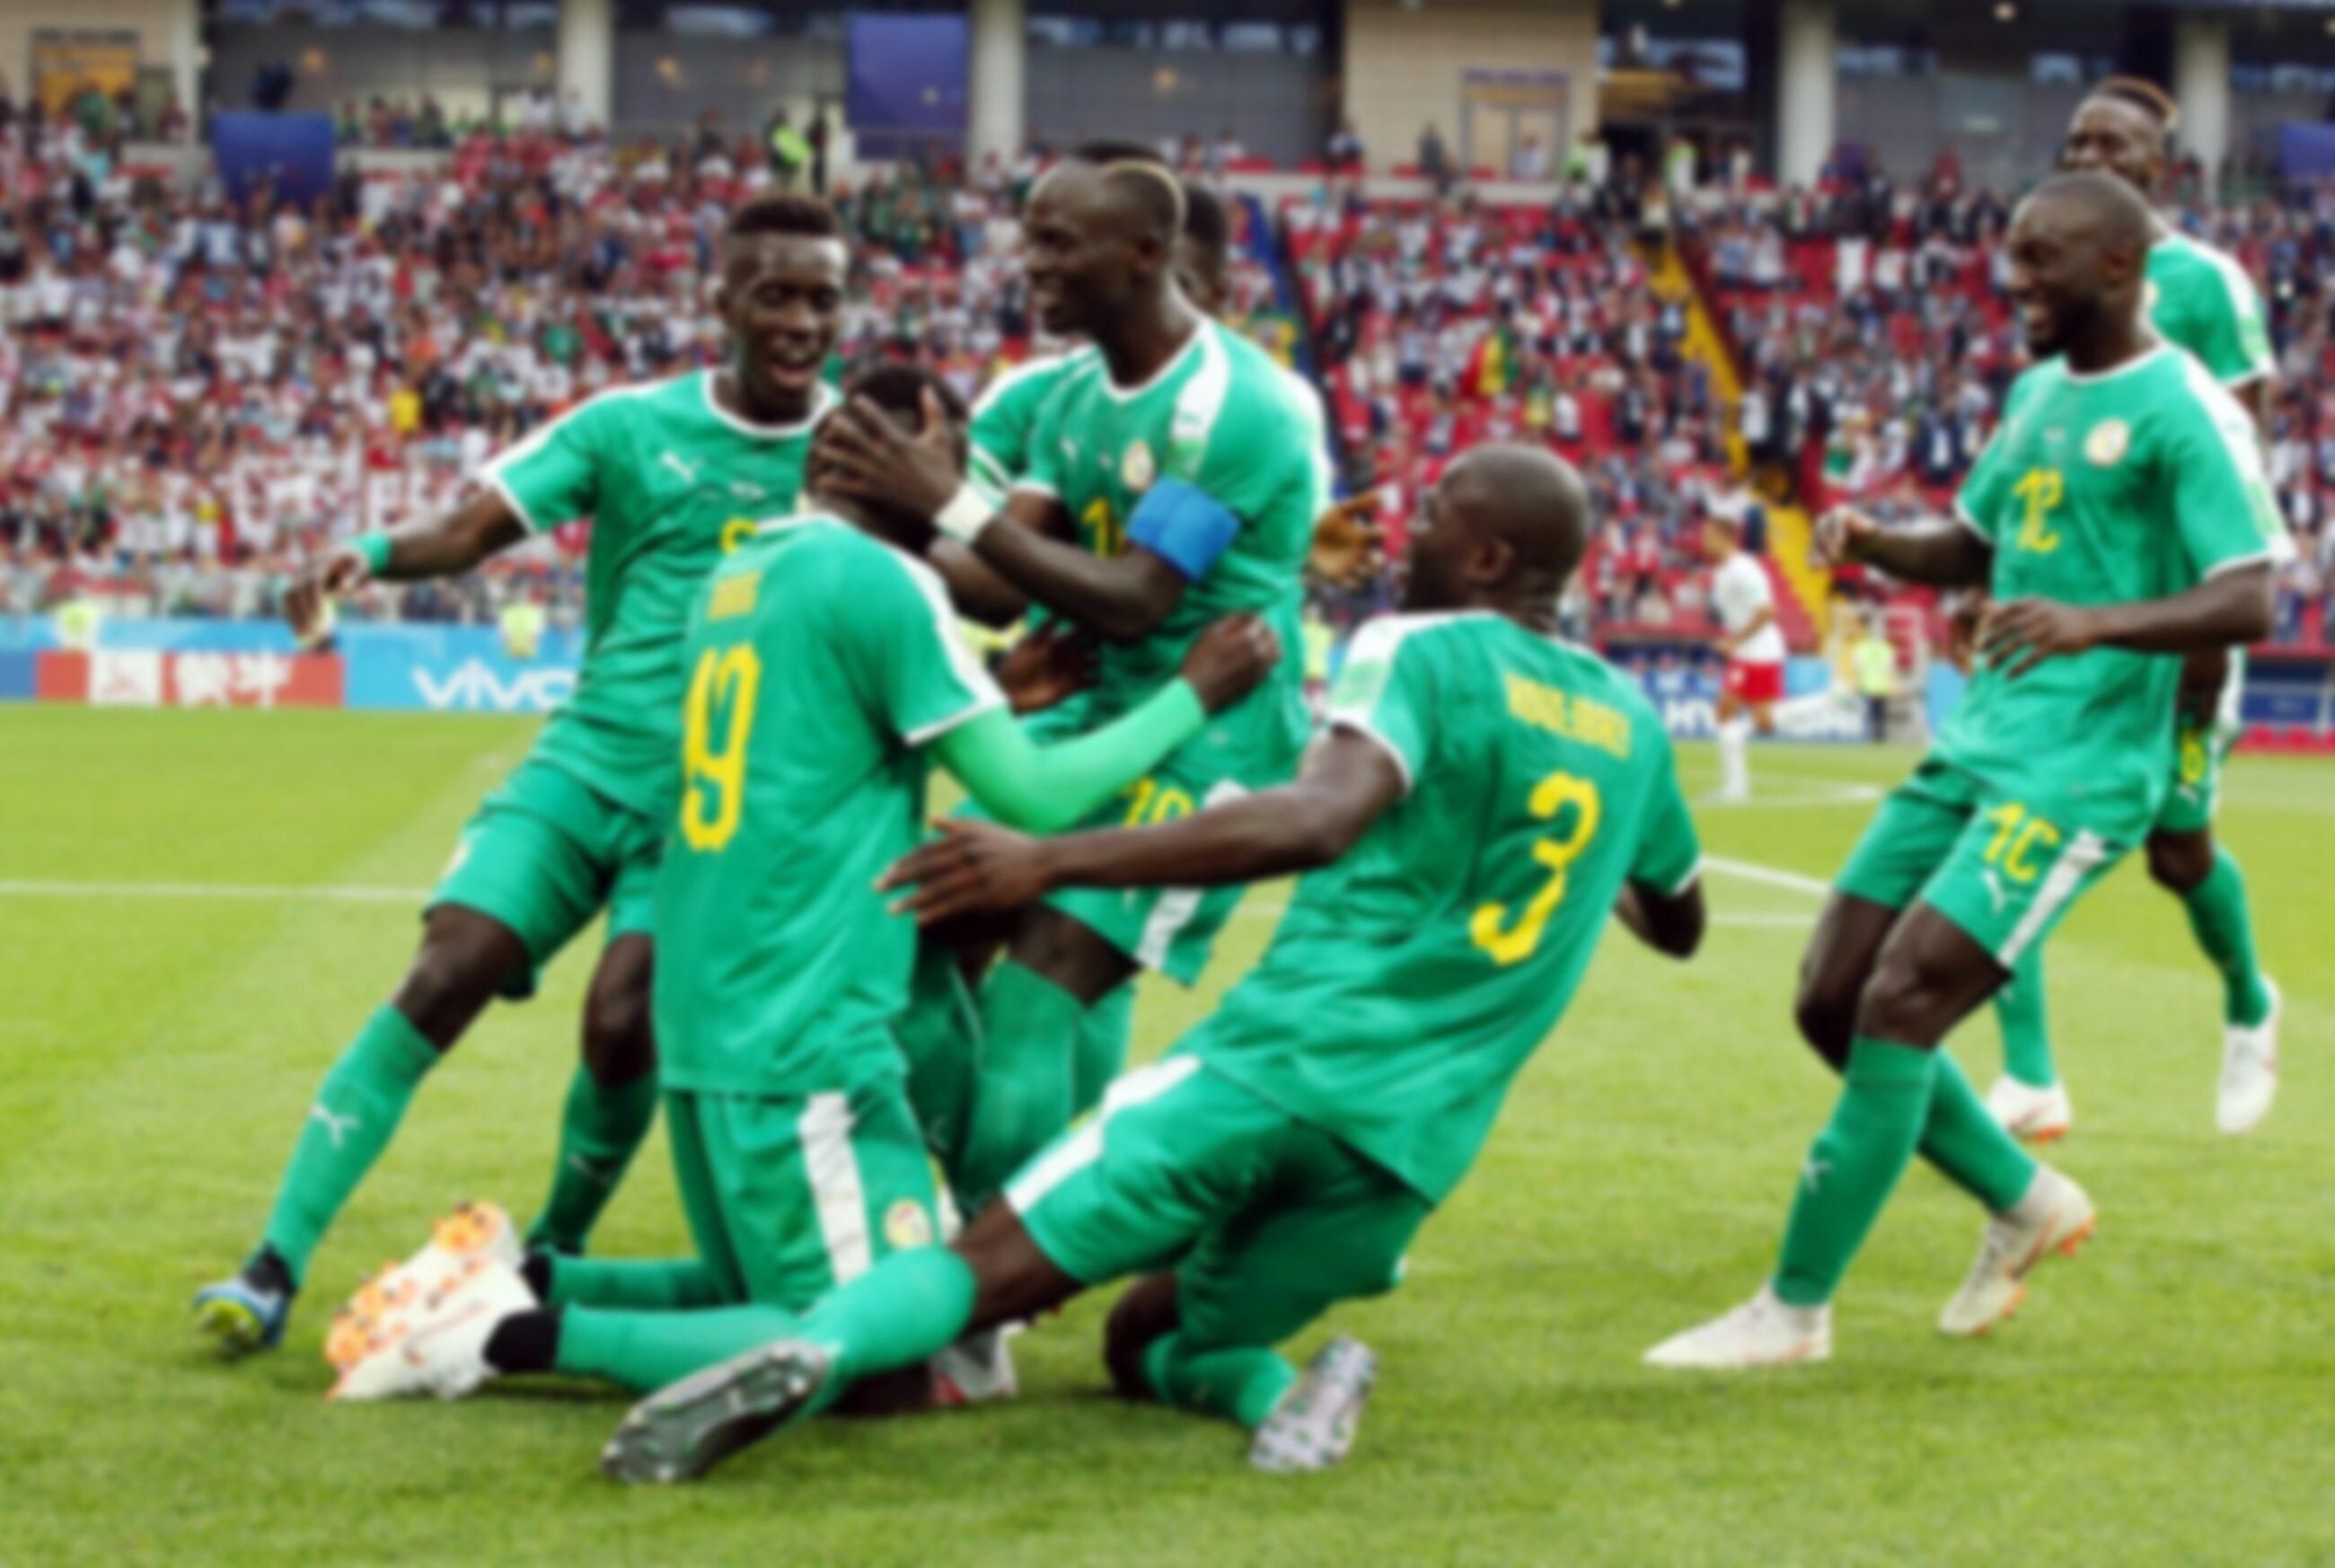 Piłkarze reprezentacji Senegalu